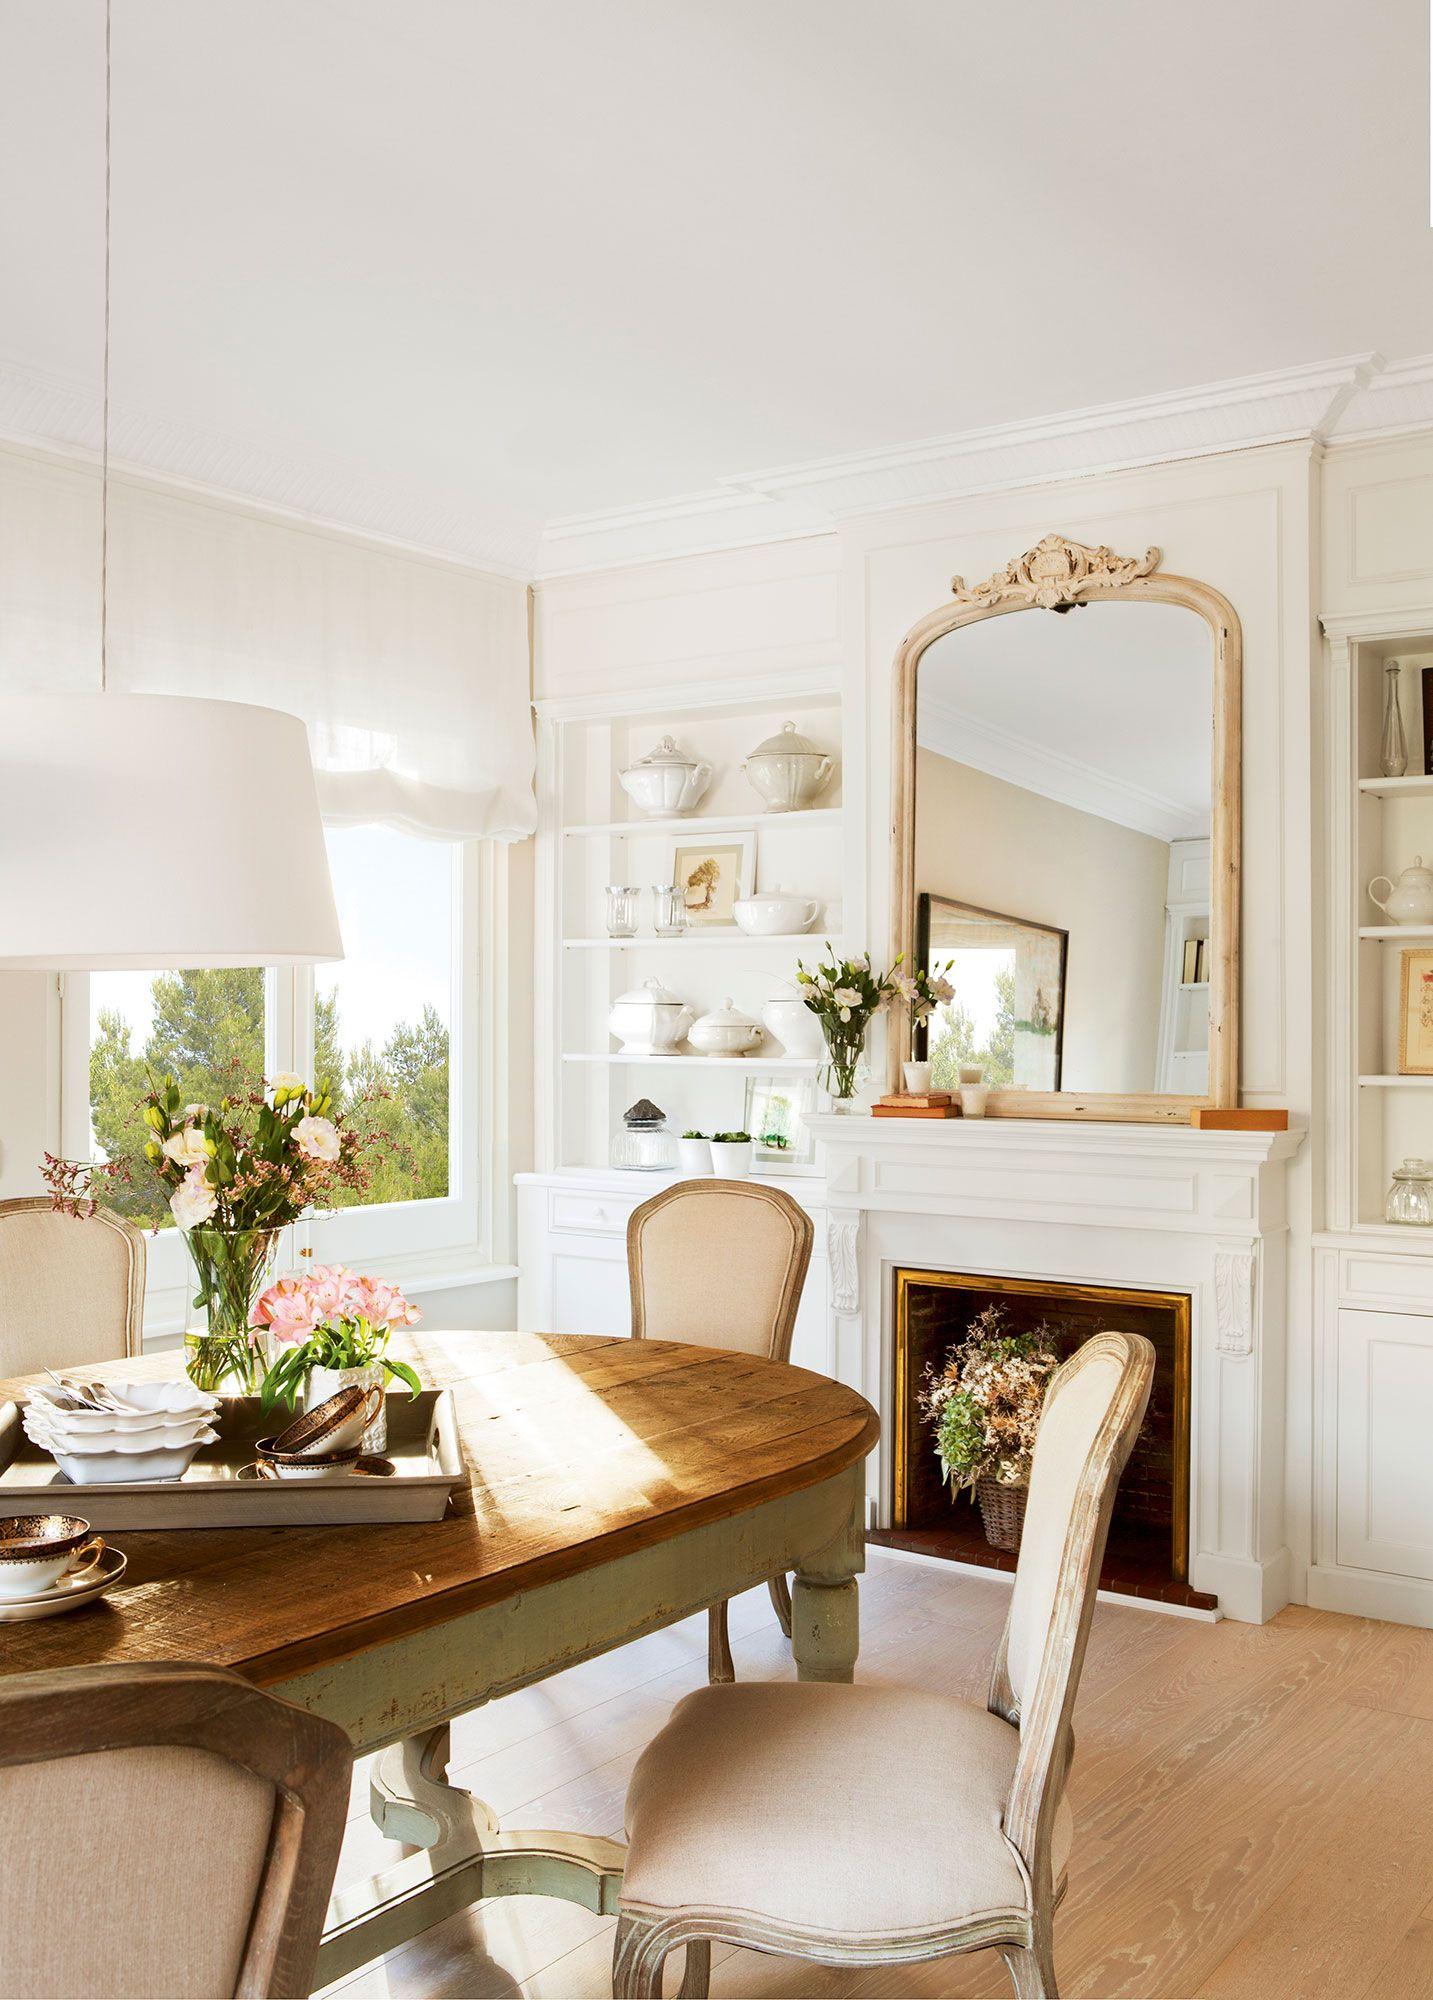 21 sabor provenzal espacios chimeneas de obra for Decoracion de cocinas comedores modernos